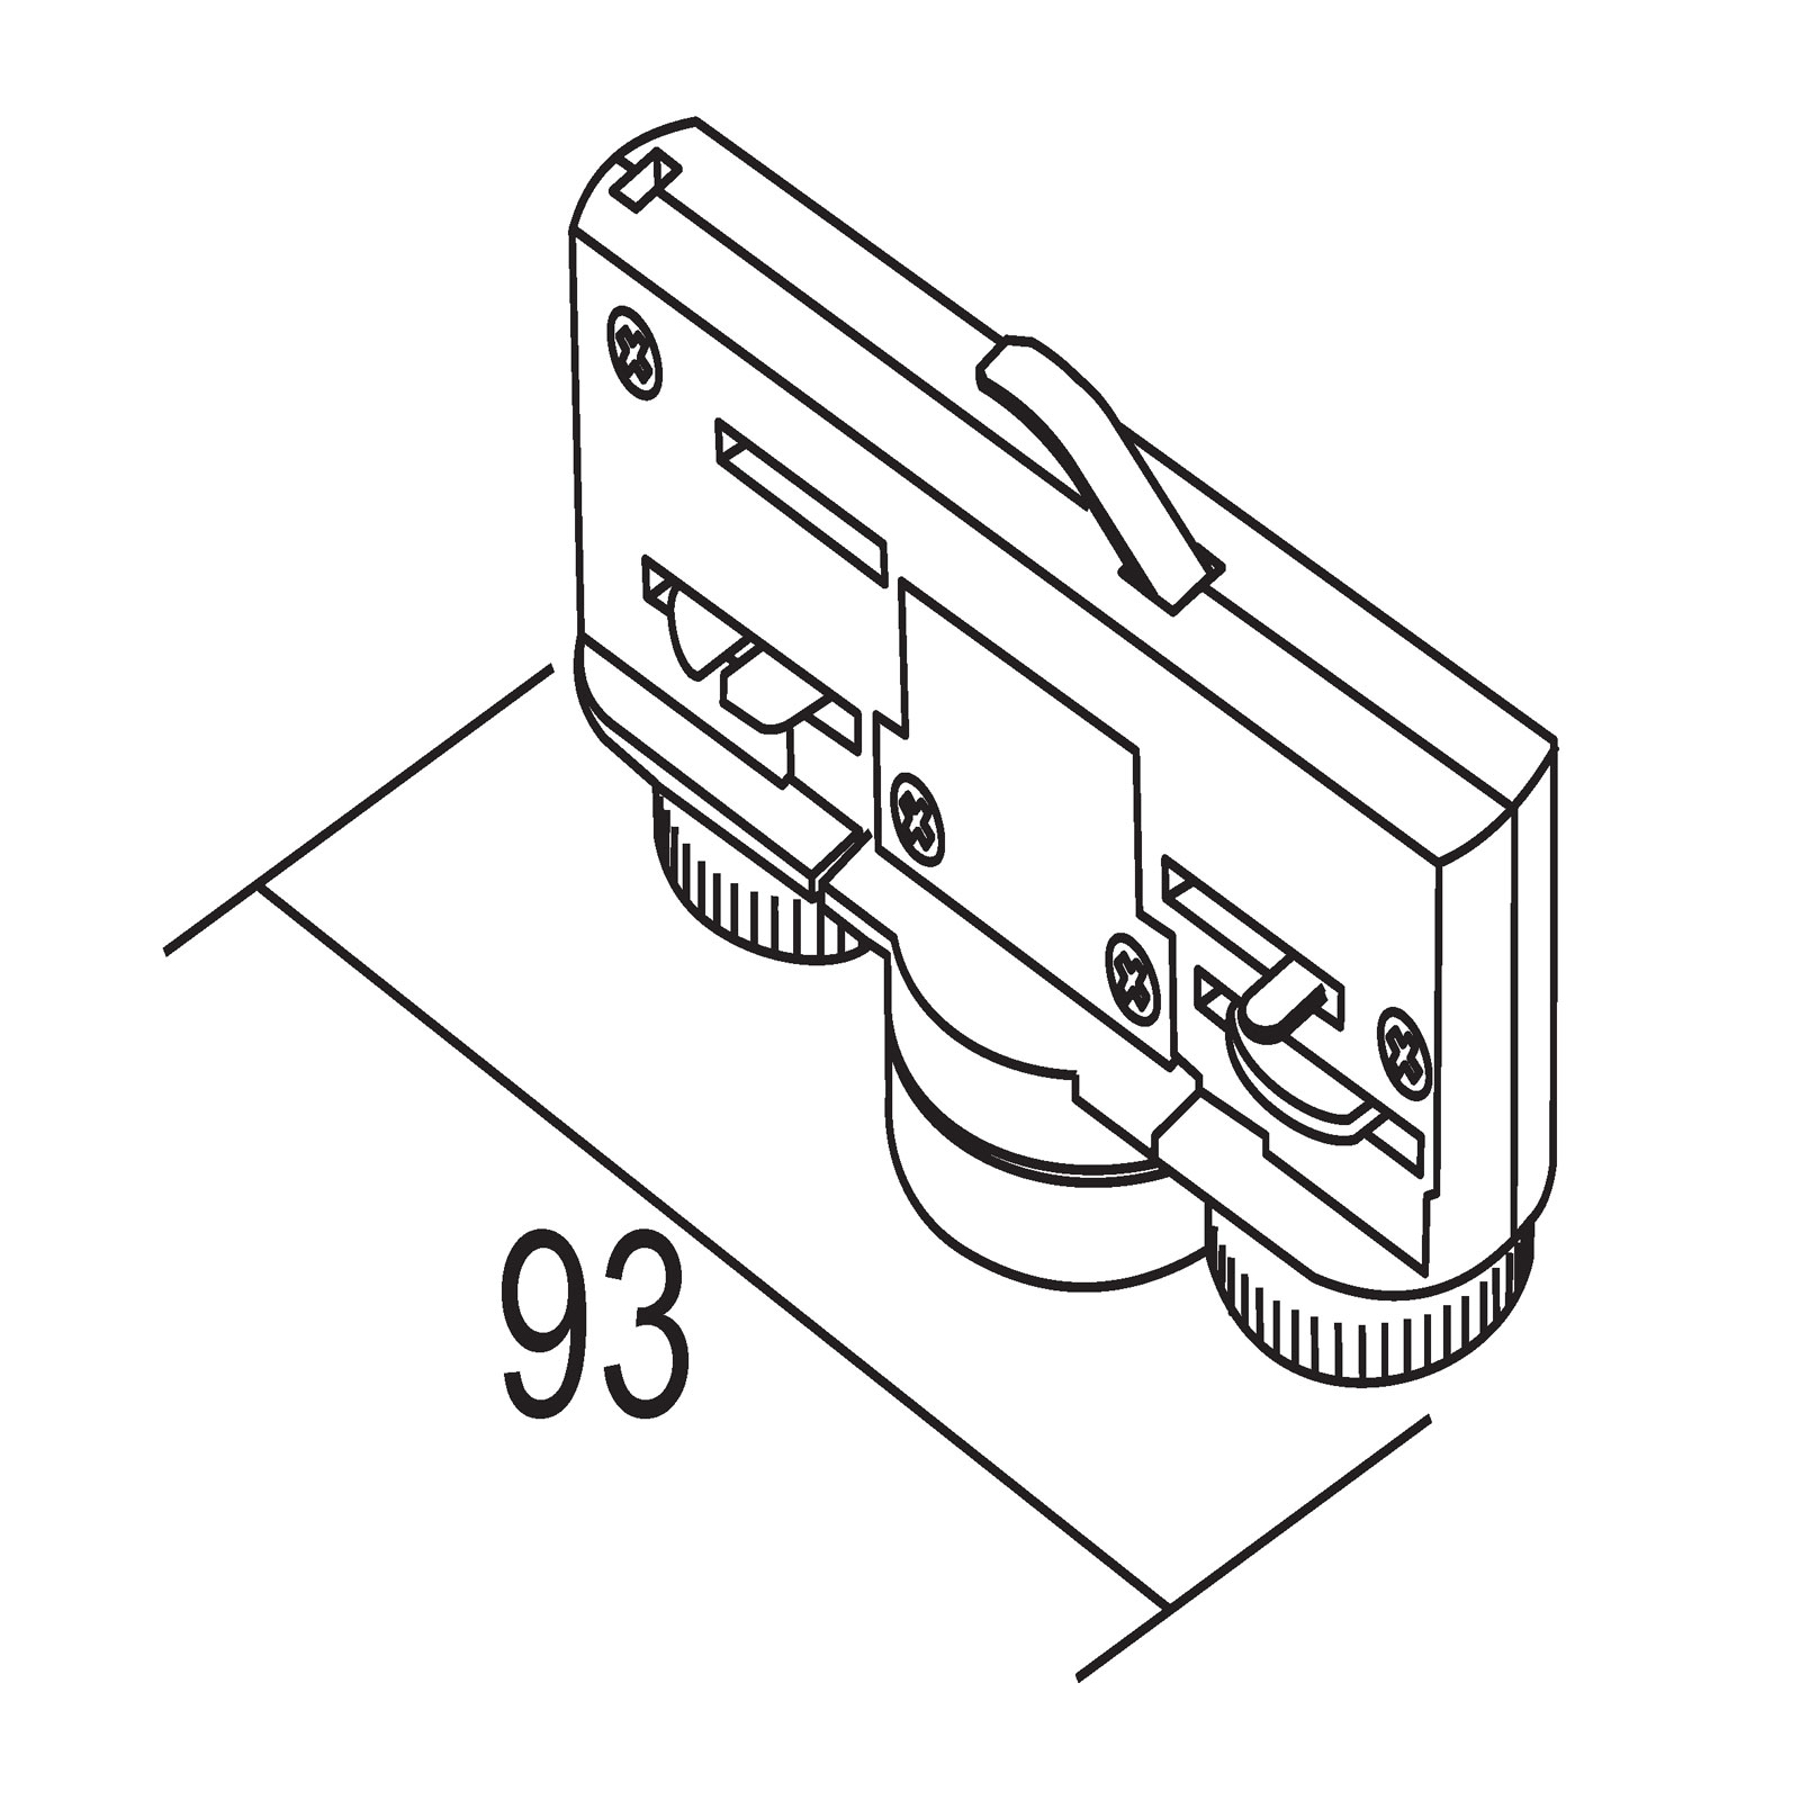 Ivela adattatore trifase 220-240V 10kg, argento